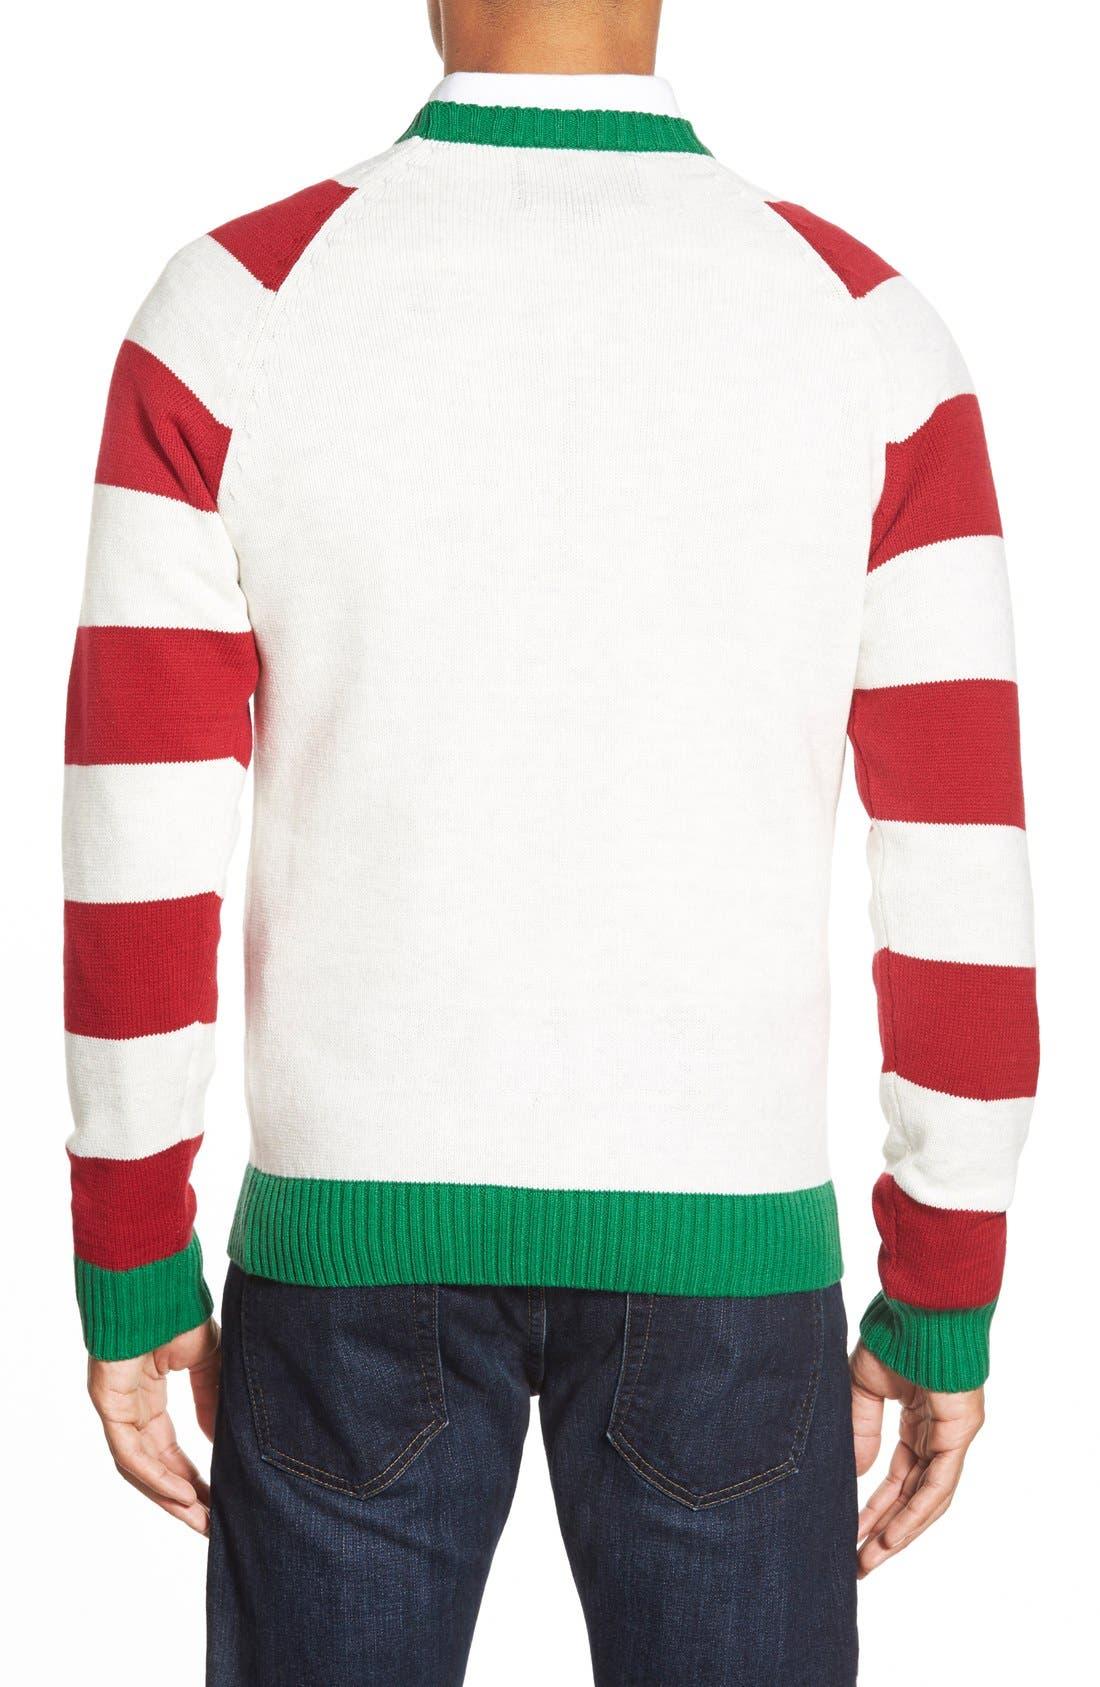 'Reindeer Stripe' Holiday Crewneck Sweater,                             Alternate thumbnail 2, color,                             100